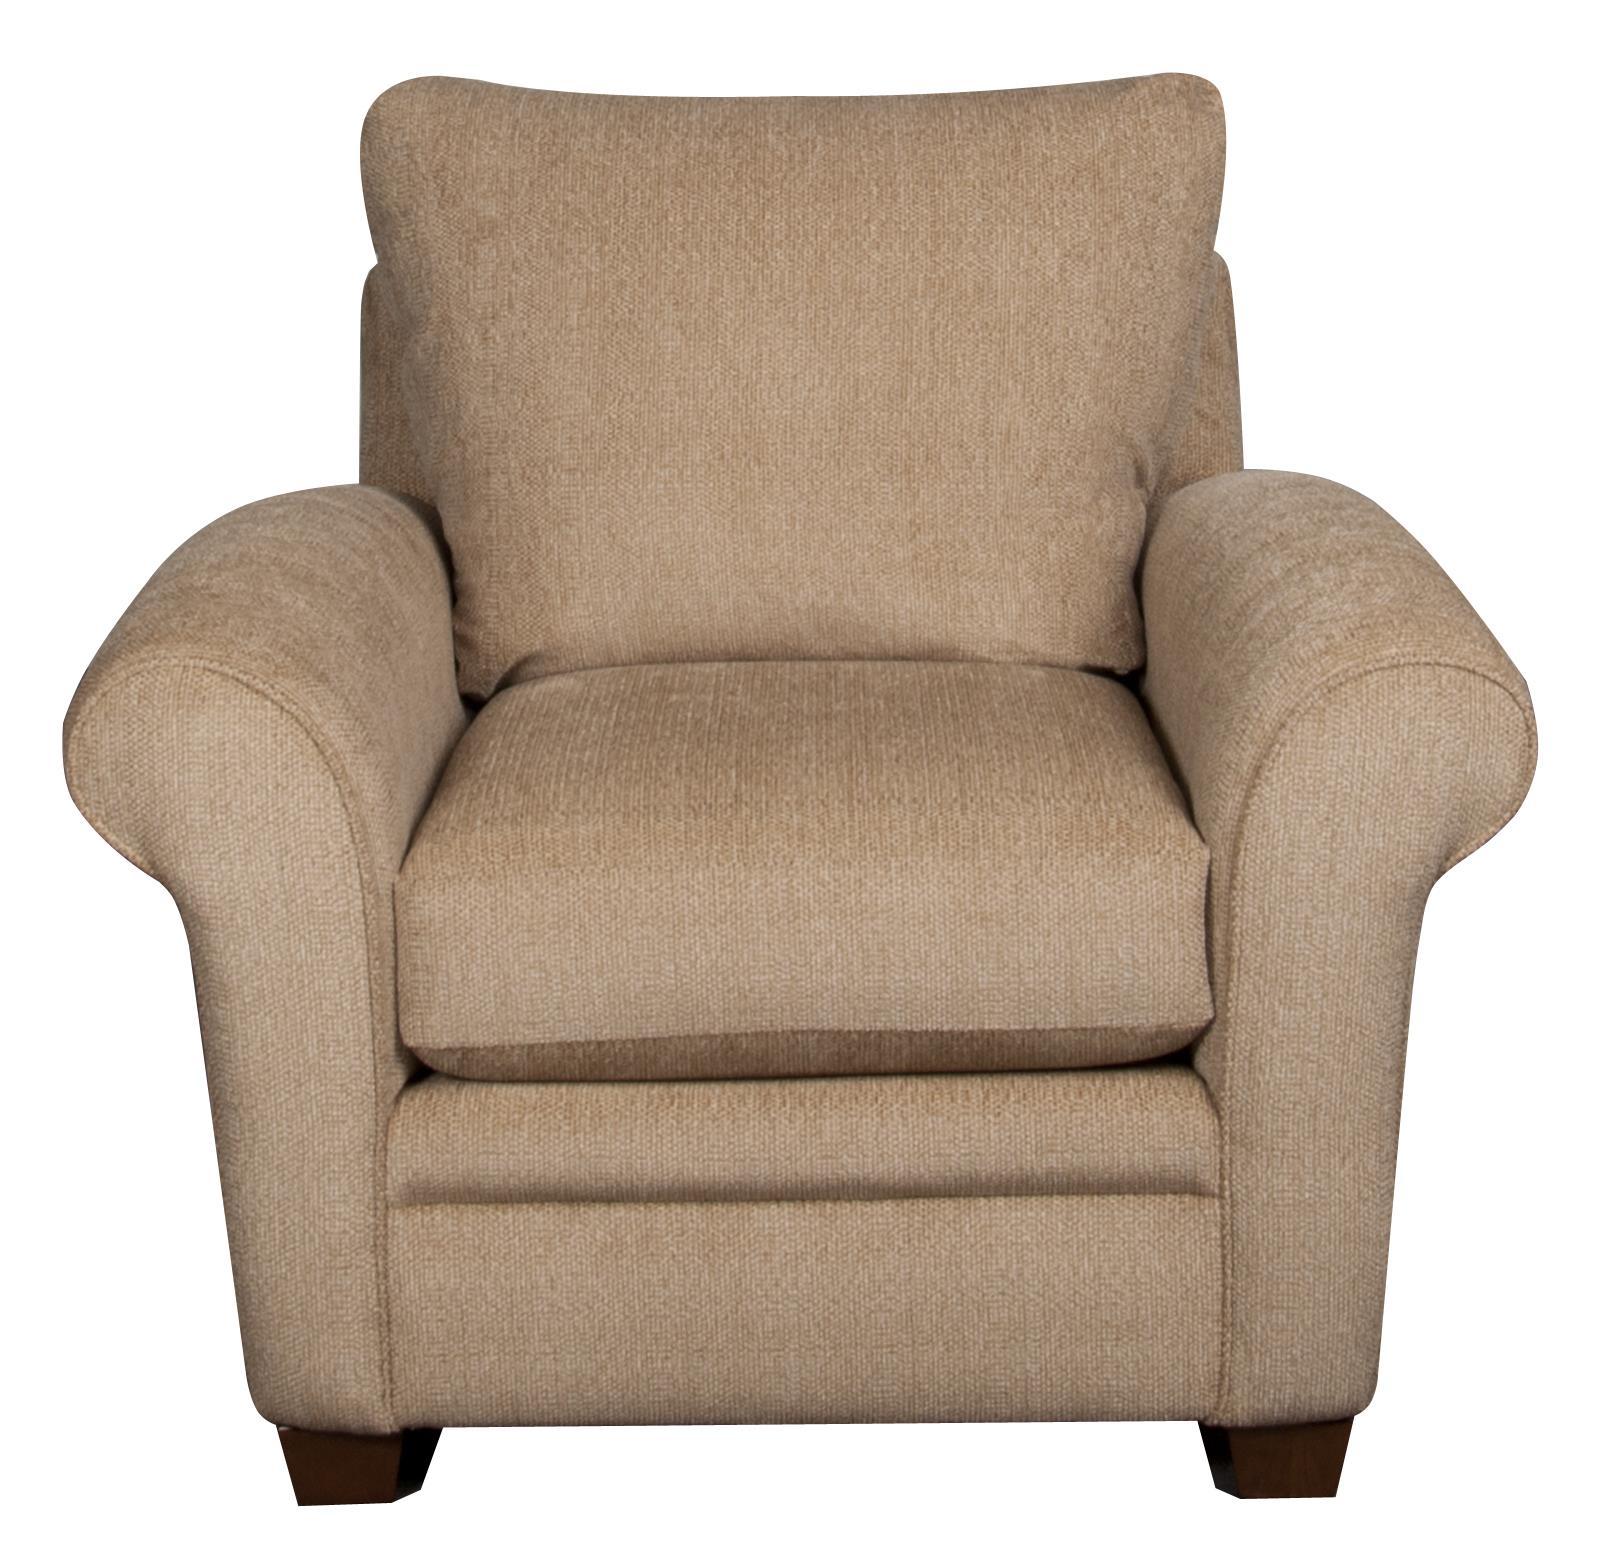 La-Z-Boy Natalie Natalie Chair - Item Number: 829128348